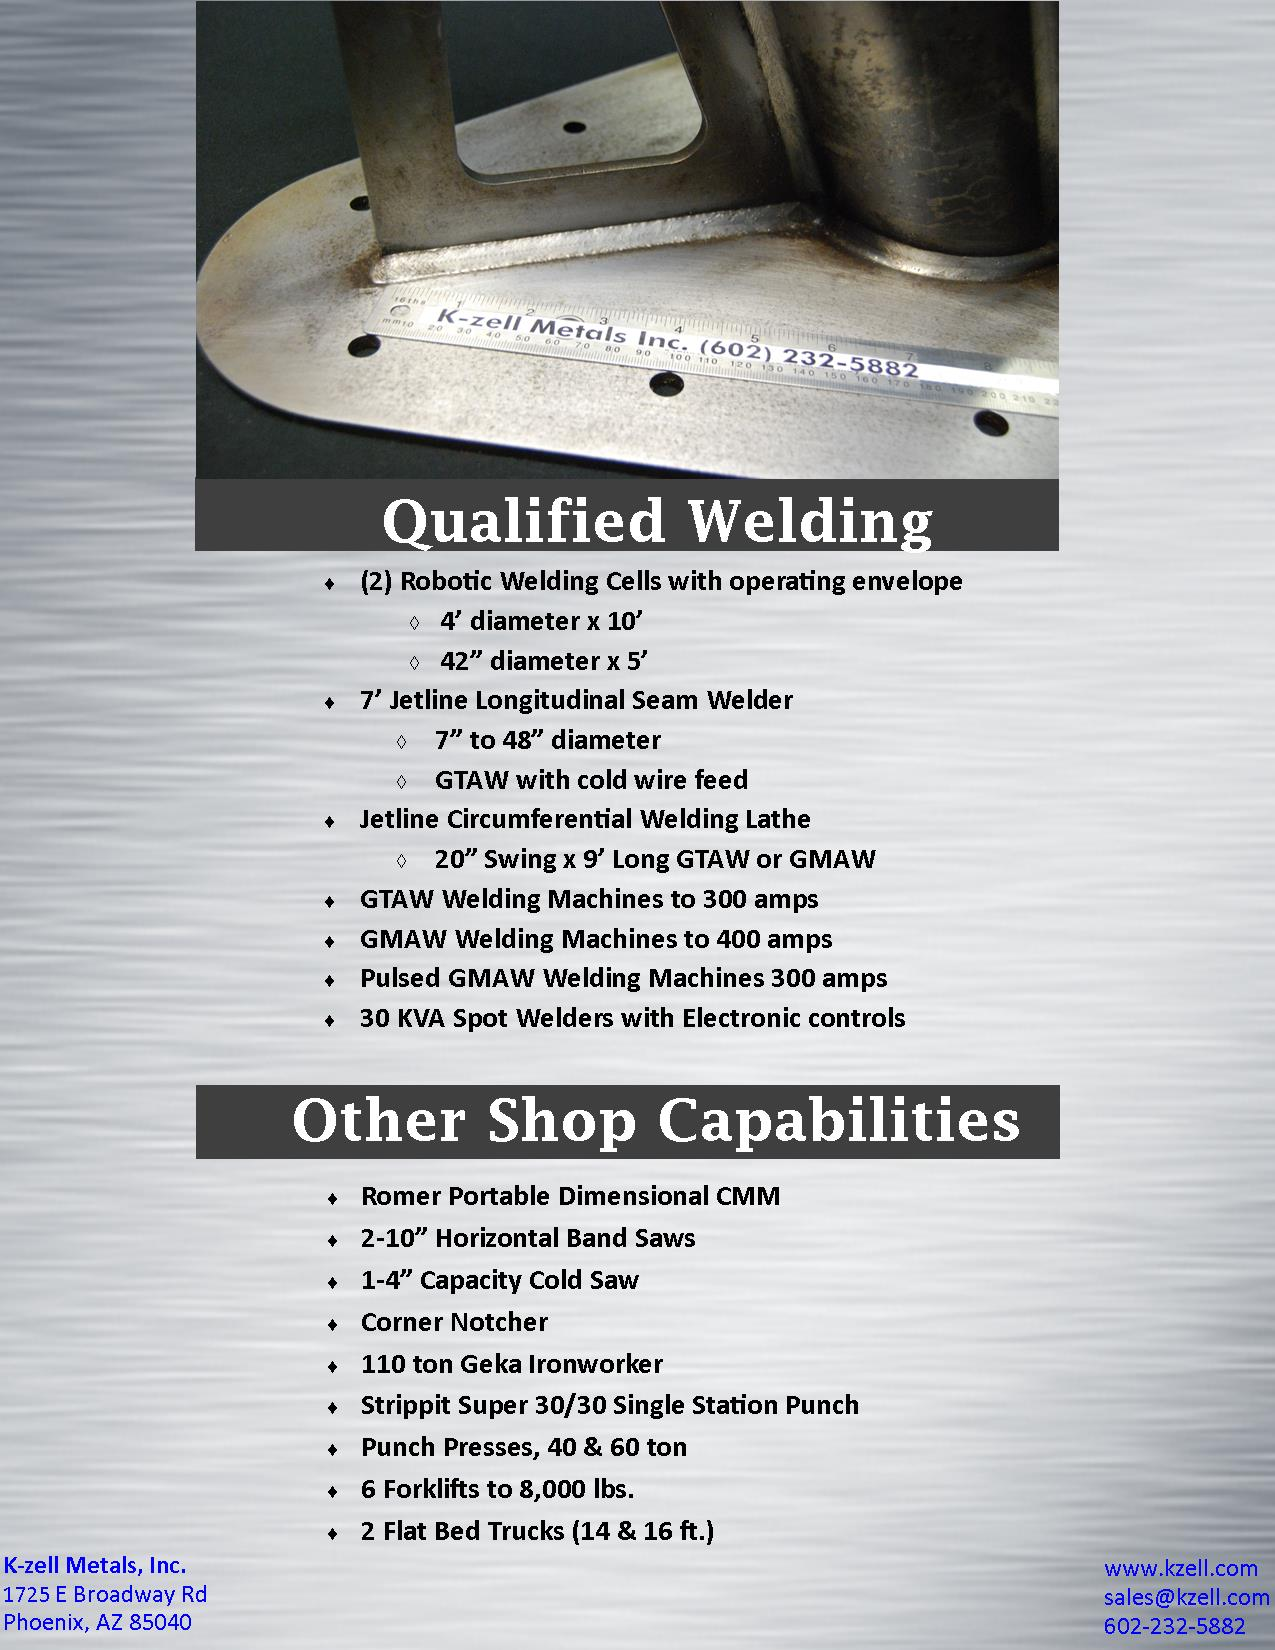 Sheet metal fabrication services custom metal services k zell k zell metals custom fabrication services 4 reheart Choice Image